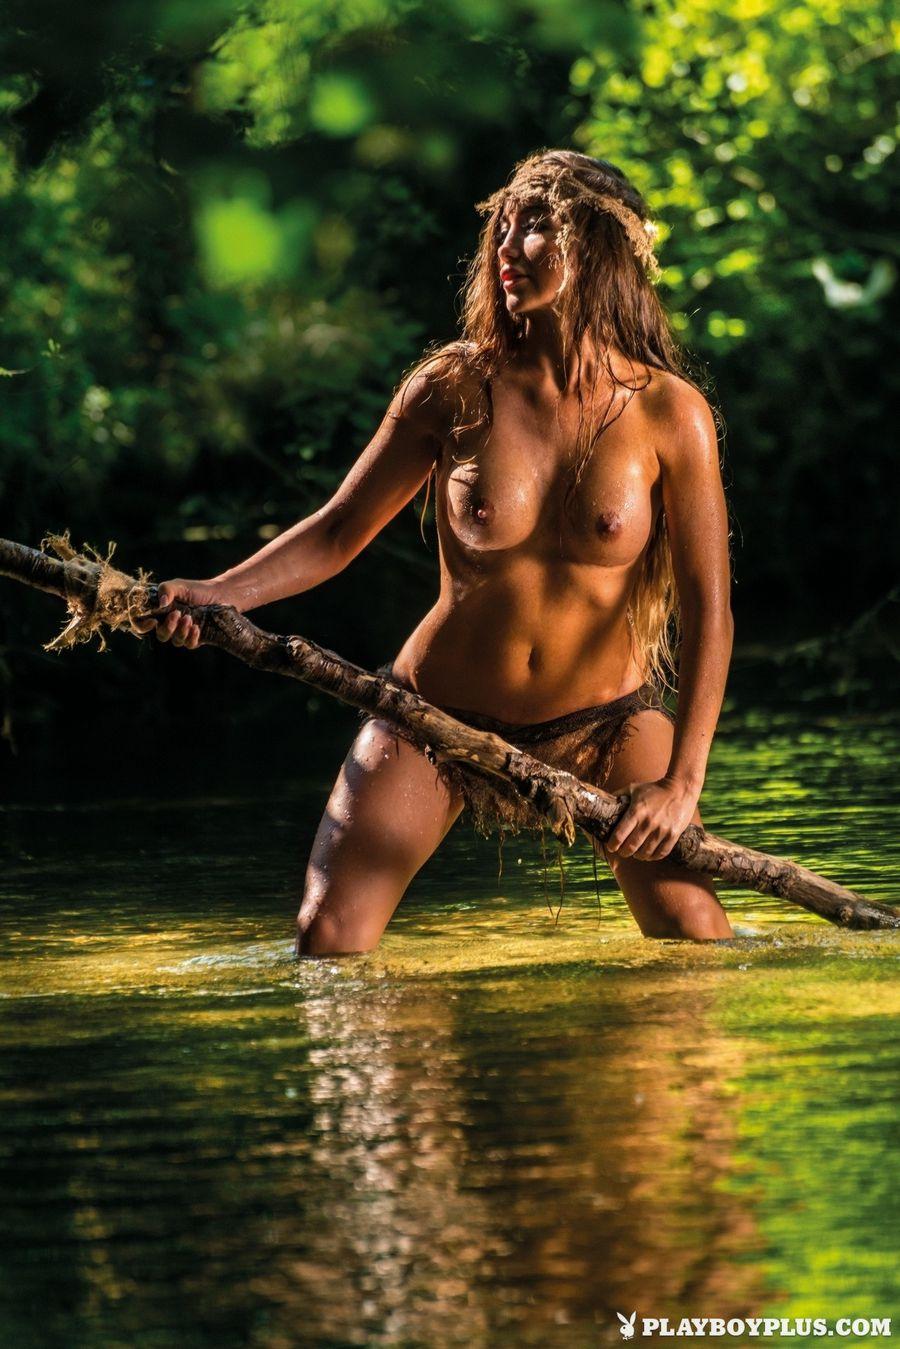 Arijana maric topless nudes (64 photos), Tits Celebrites images